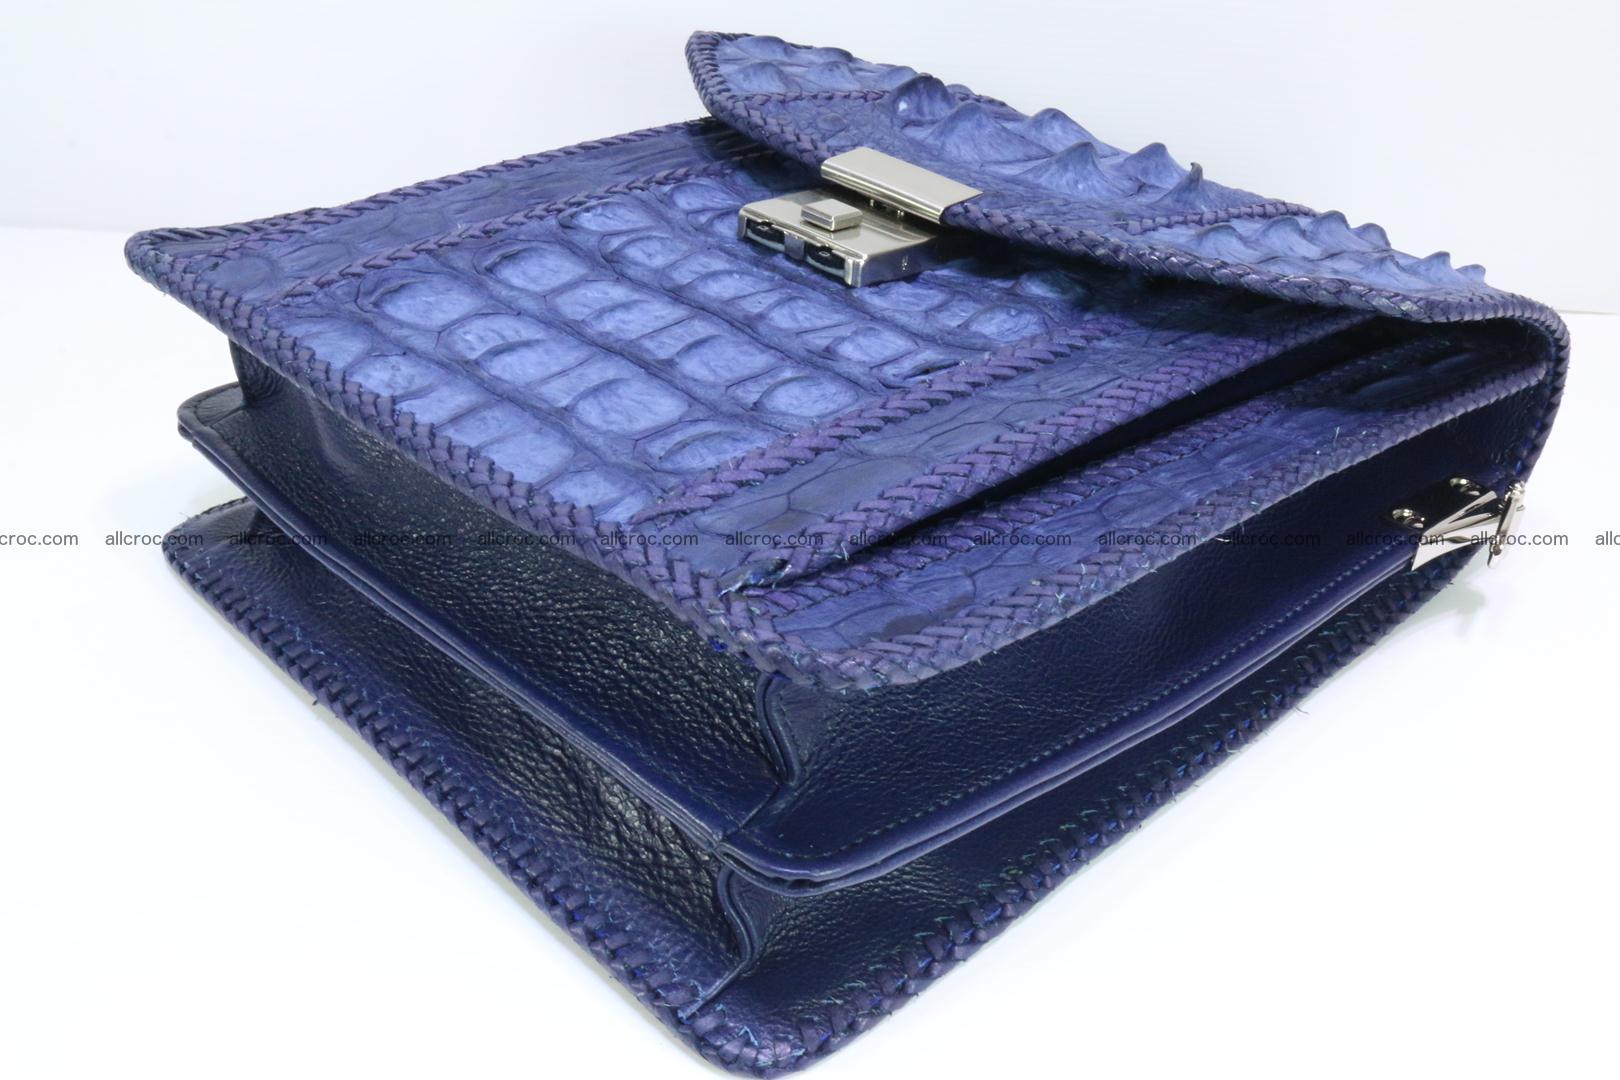 Crocodile skin messenger bag braided edges 422 Foto 11